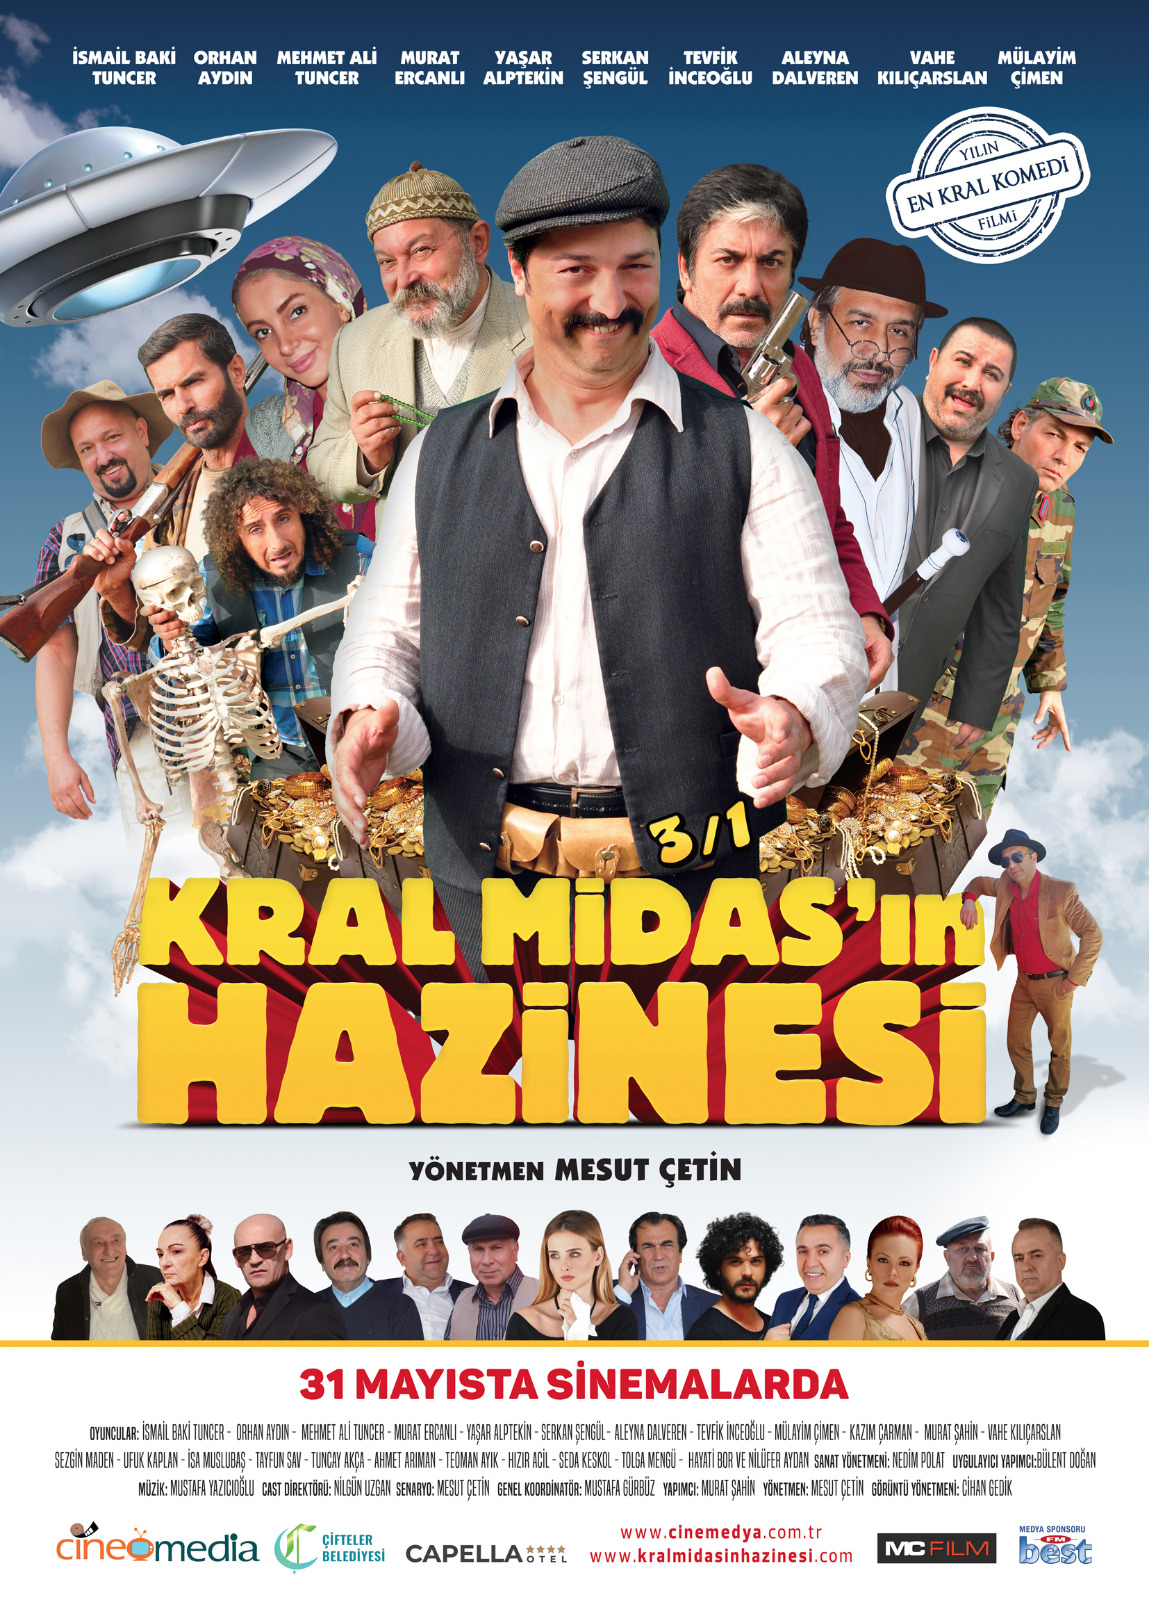 Kral Midas'in Hazinesi kapak